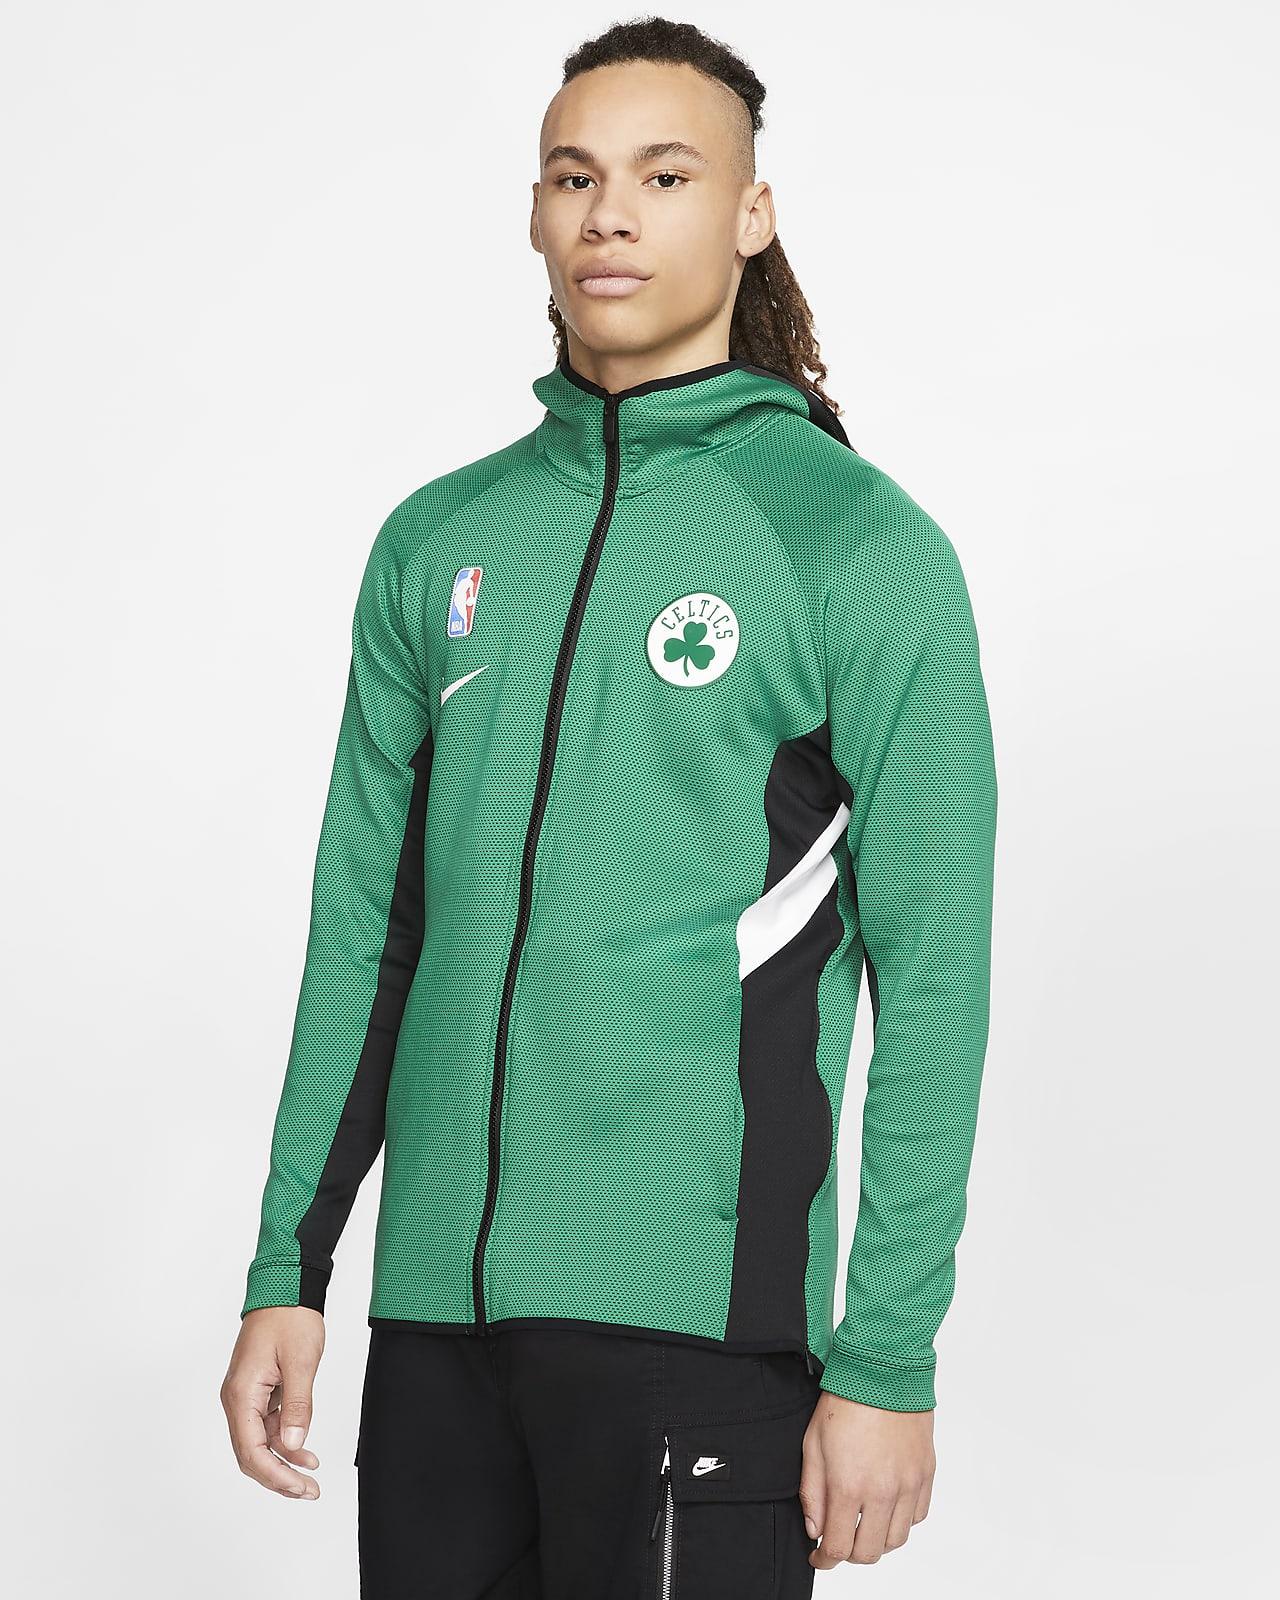 Sudadera con capucha de la NBA para hombre Boston Celtics Nike Therma Flex Showtime